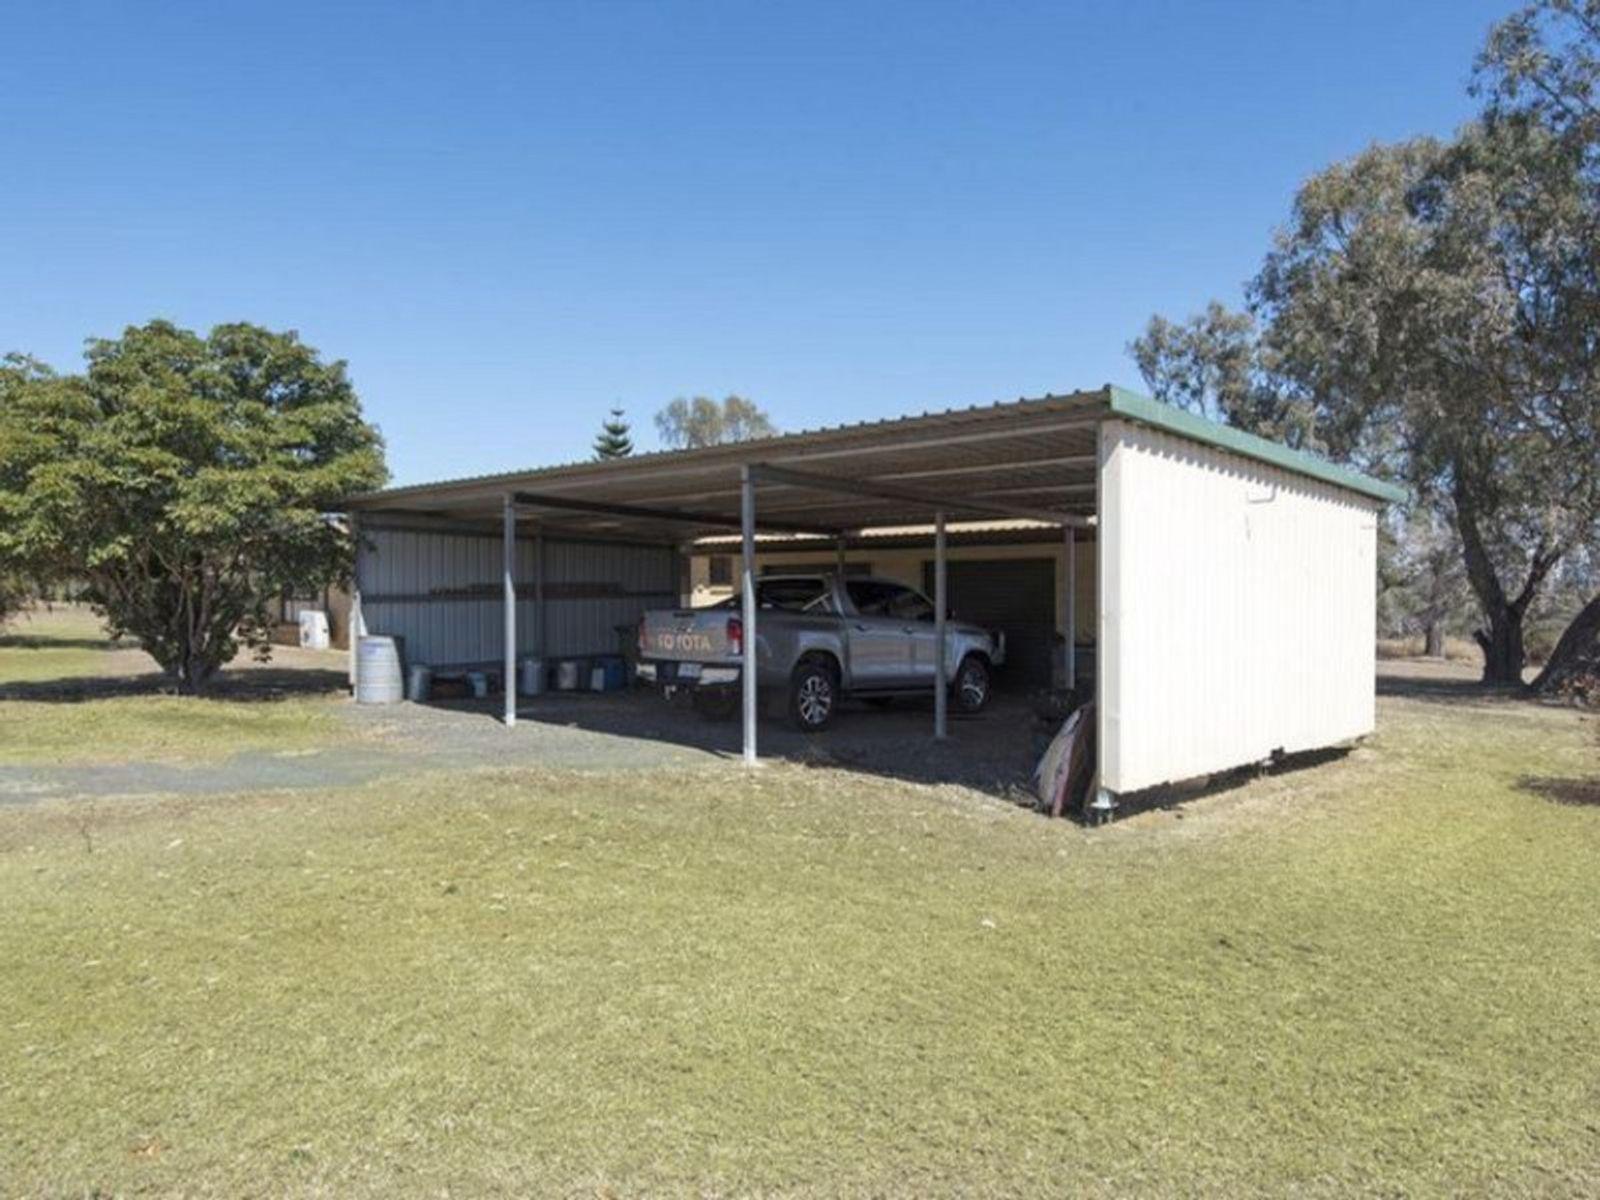 1272 Toowoomba Cecil Plains Road, Wellcamp, QLD 4350